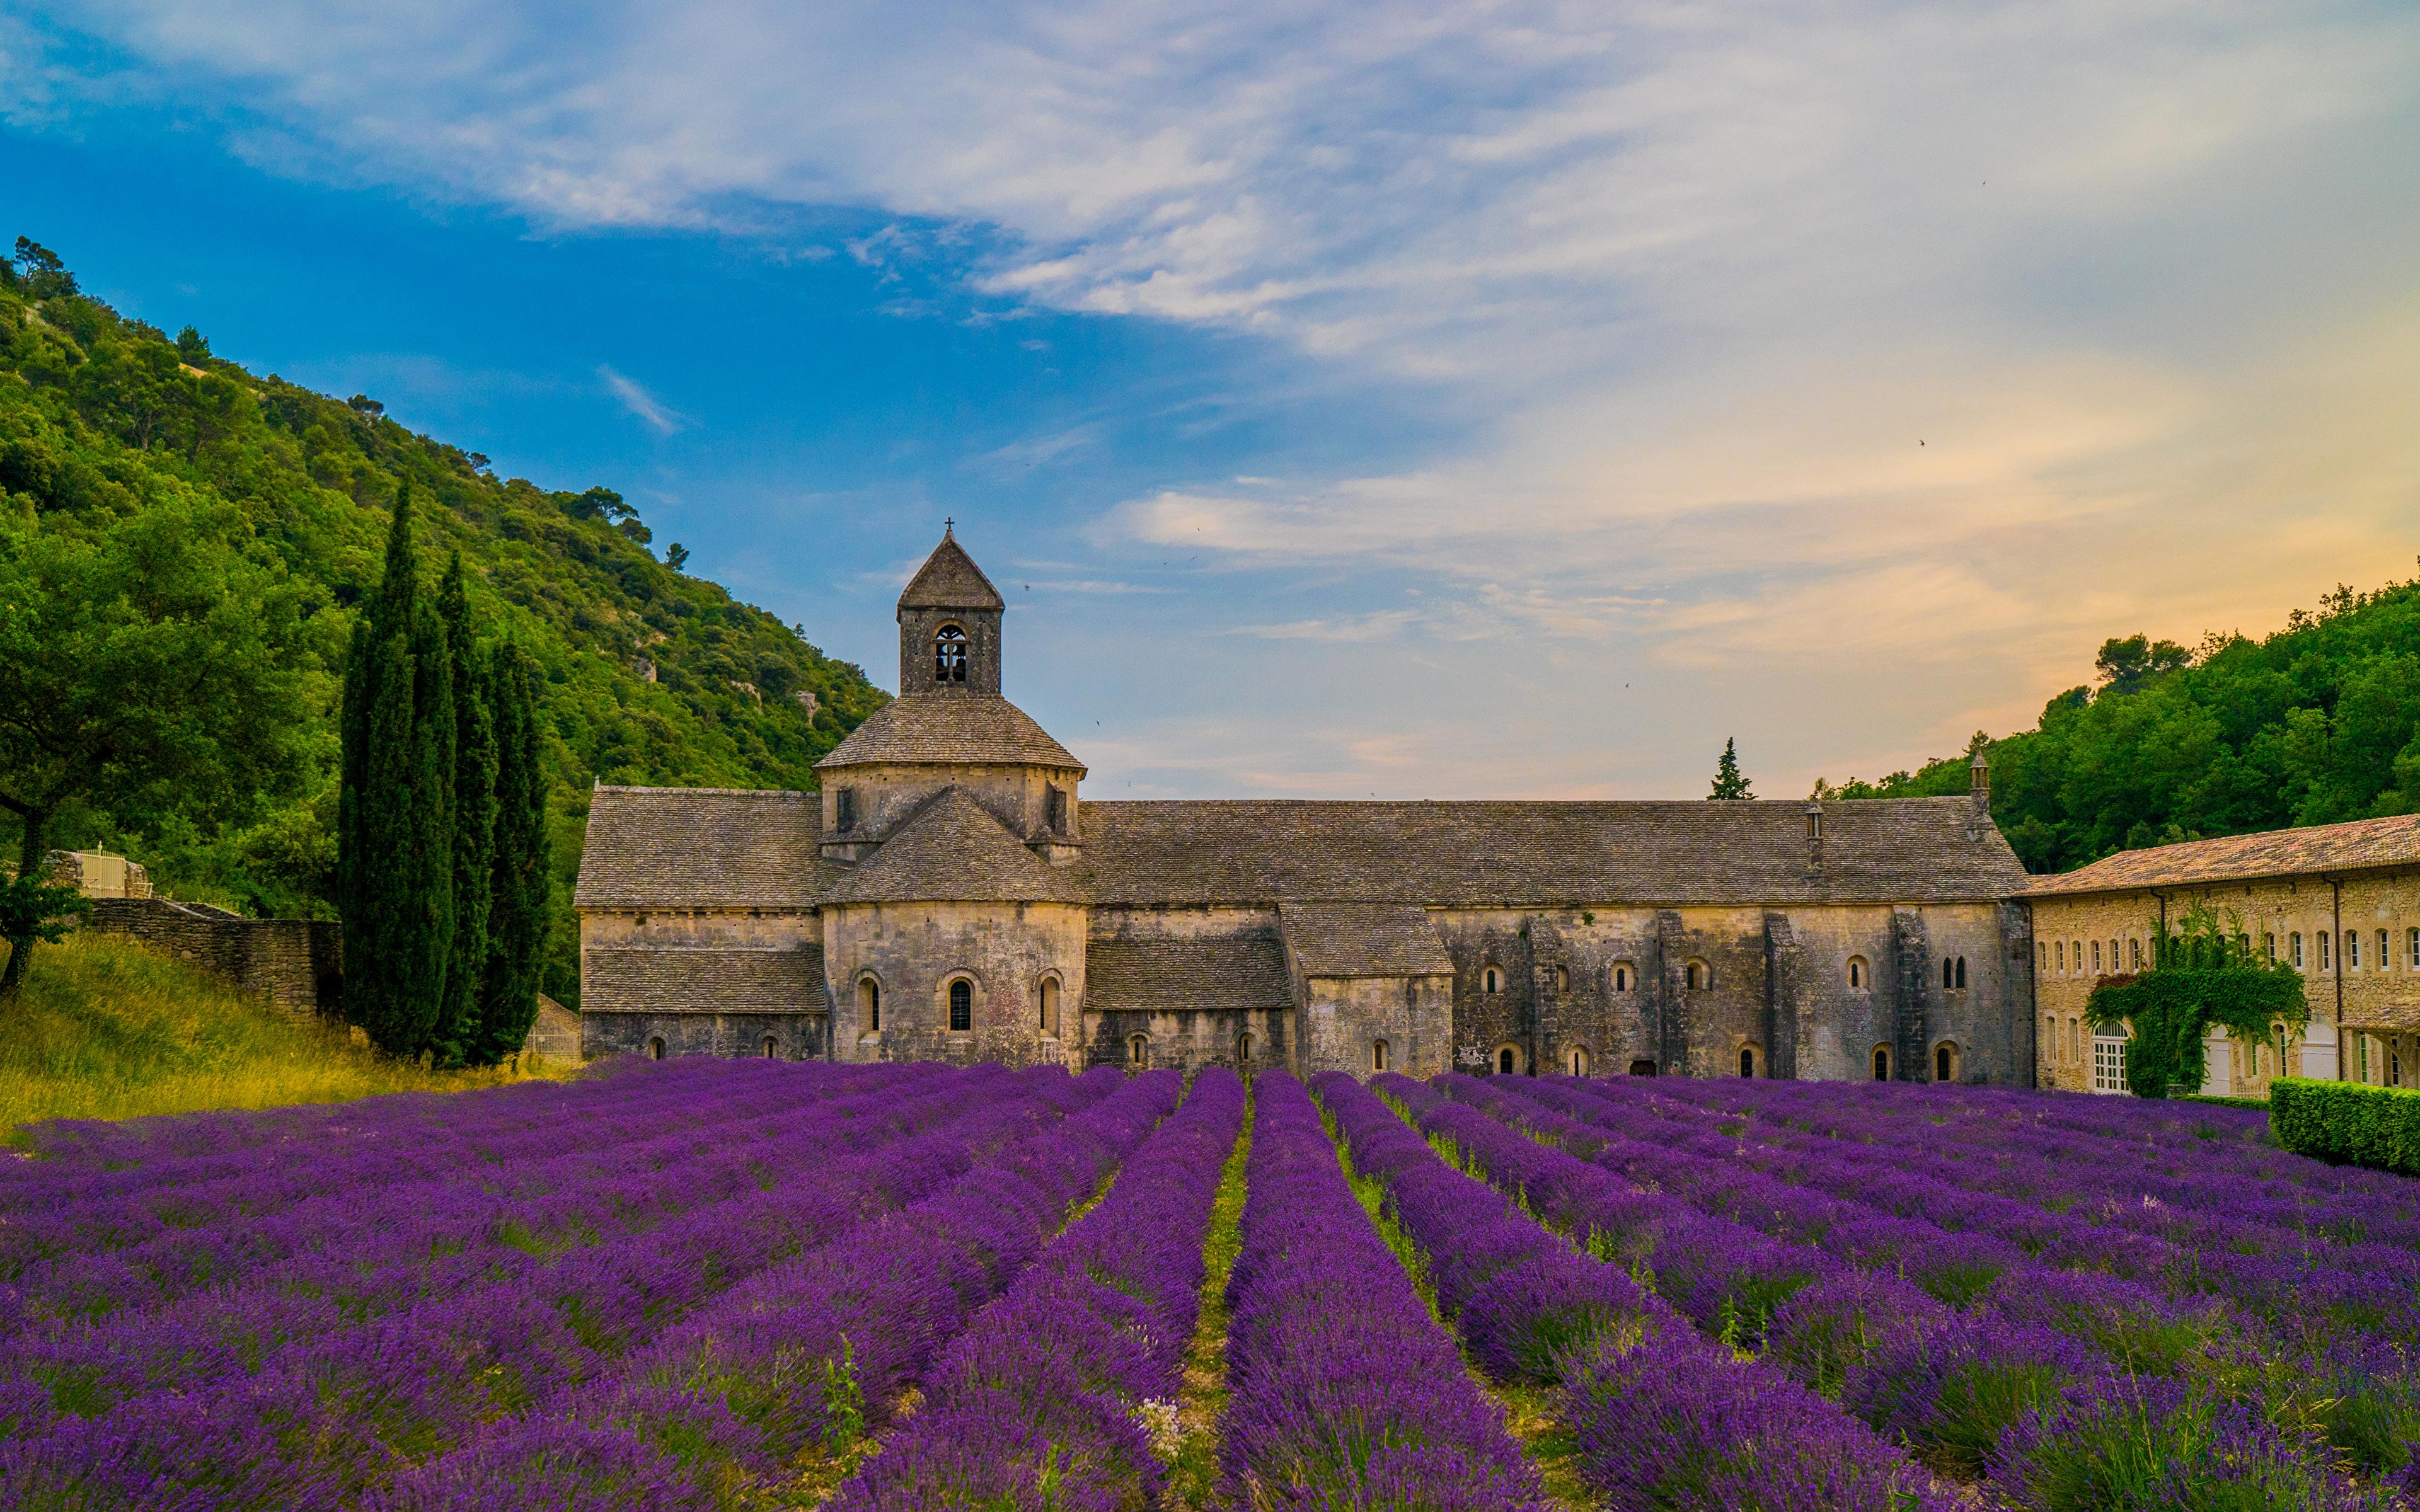 Wallpaper Monastery France Senanque Abbey Fields Lavandula 3840x2400 3840x2400